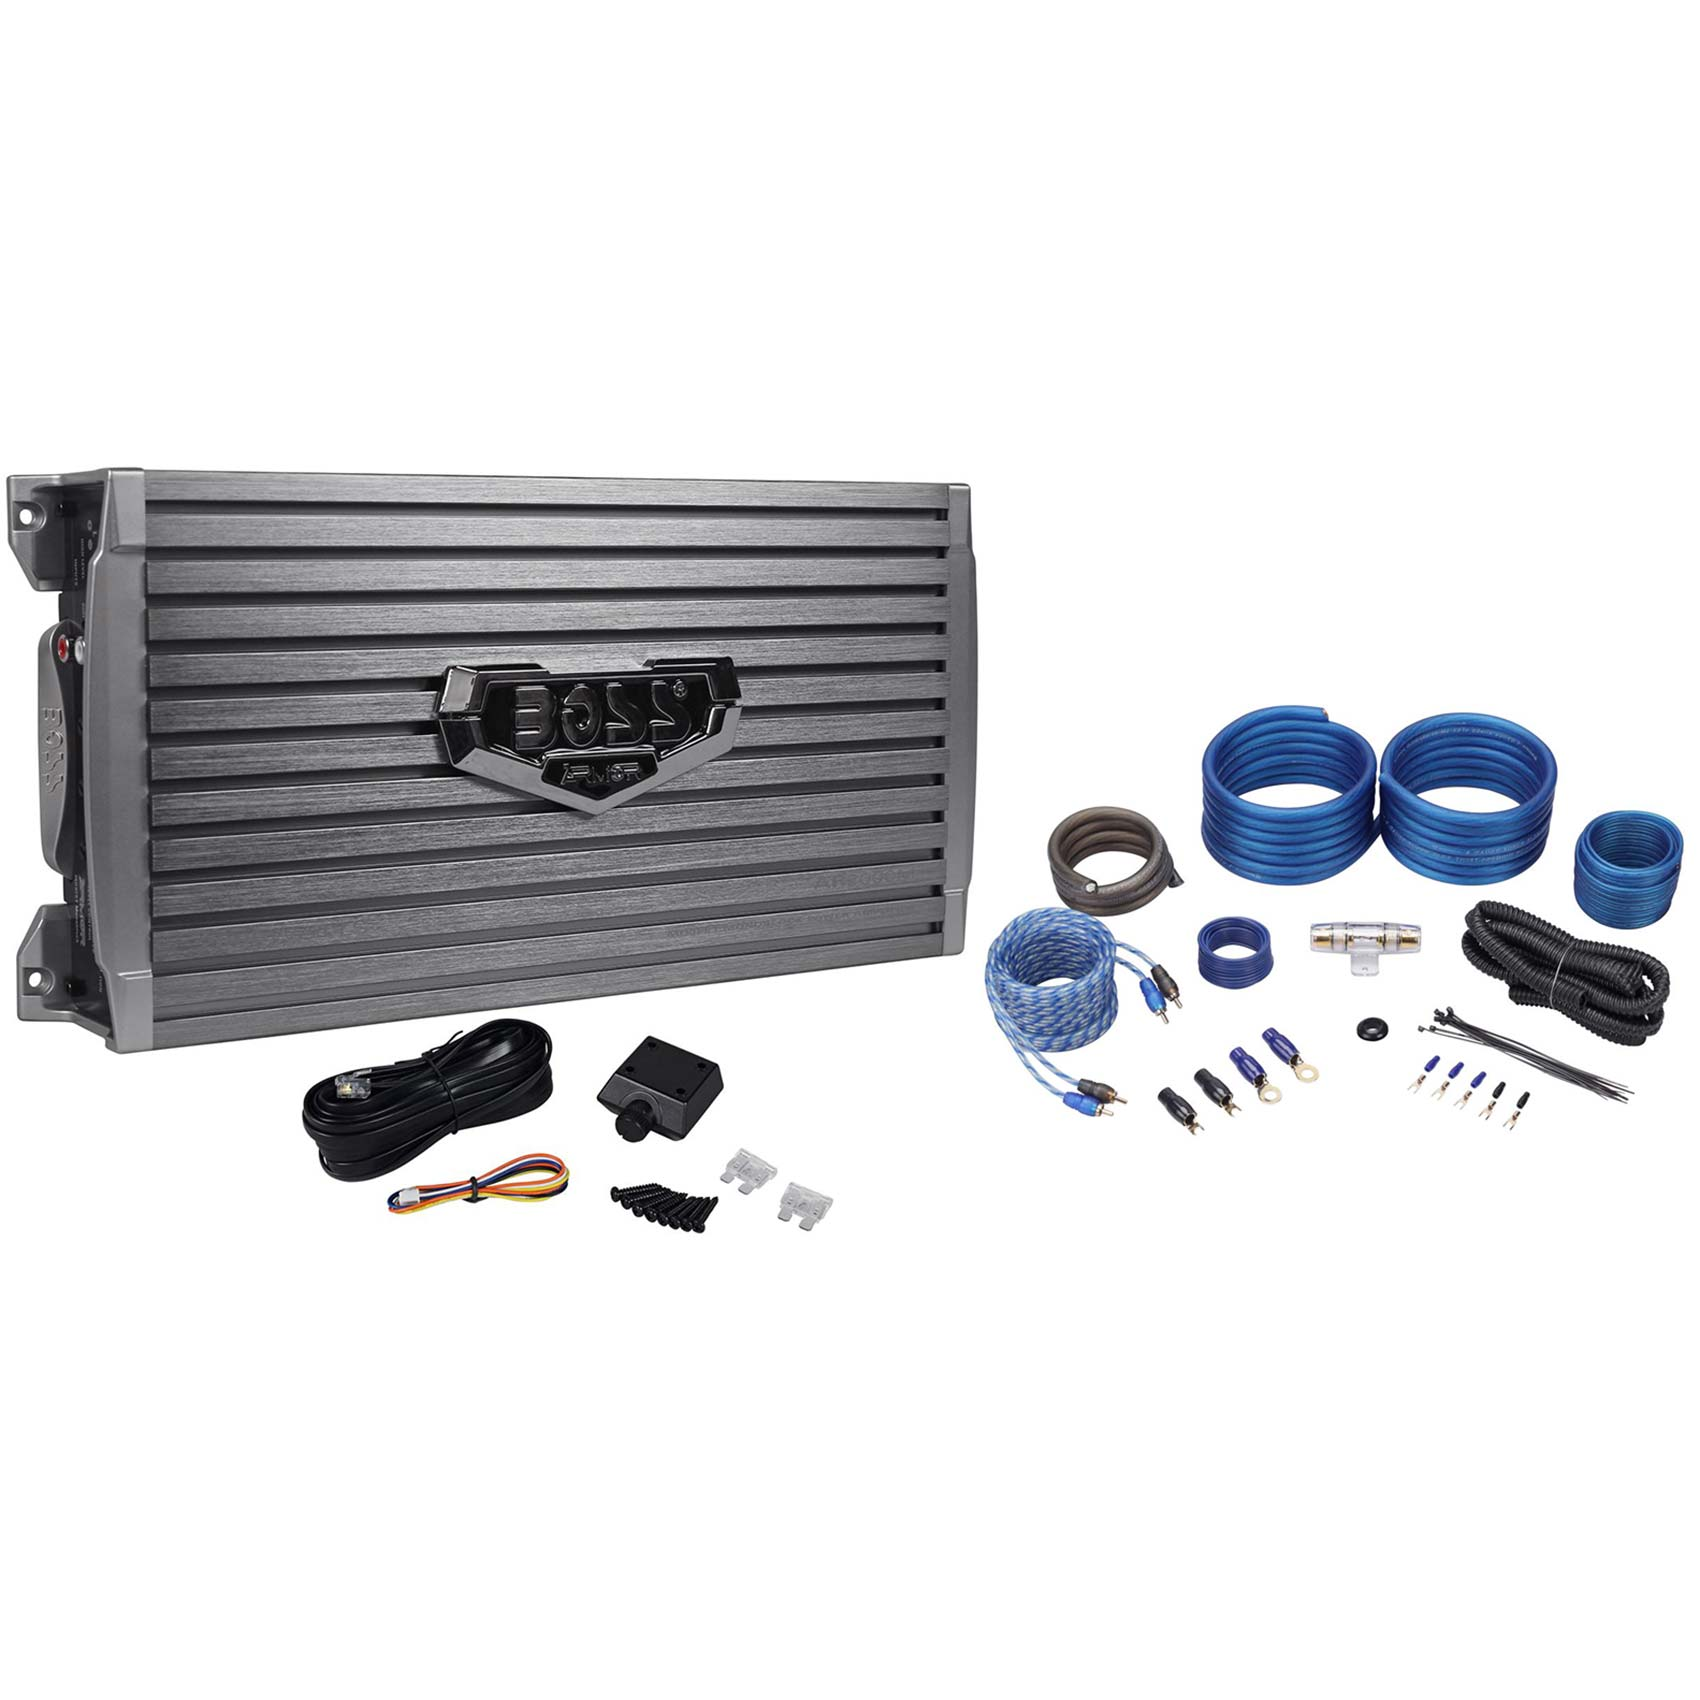 New Boss Armor AR2000M 2000W Mono Car Audio Amplifier+Amp Wire Kit+Bass Remote